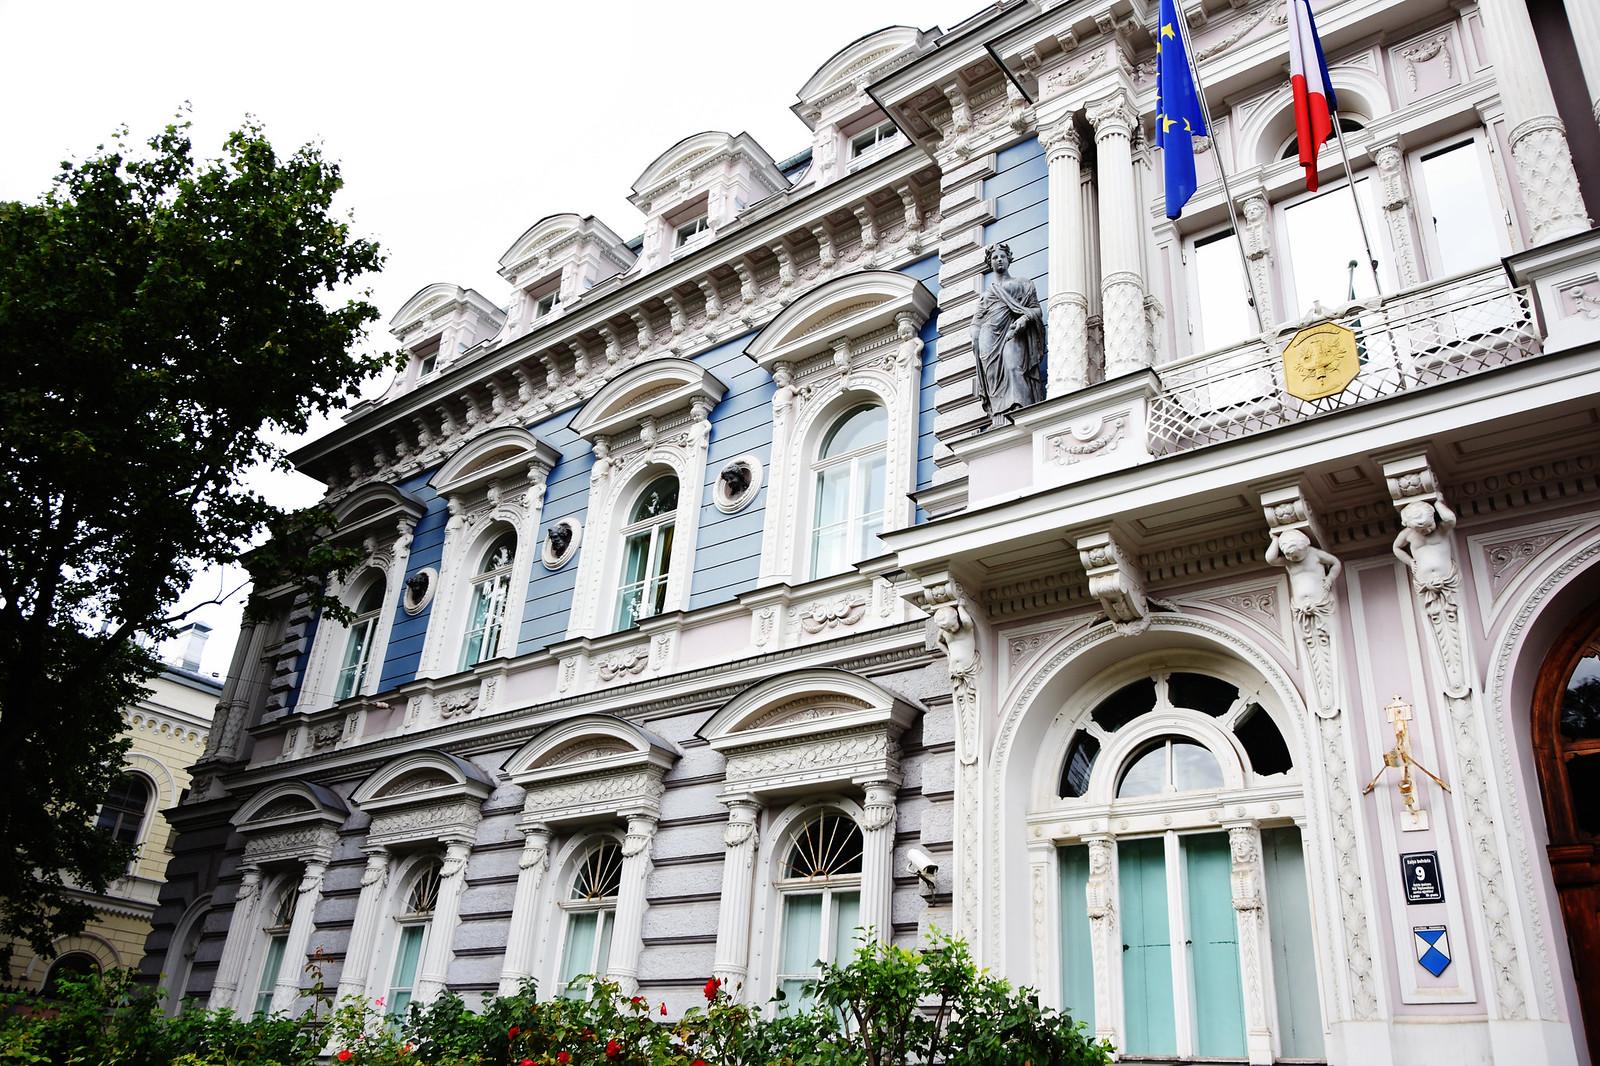 French ambassady